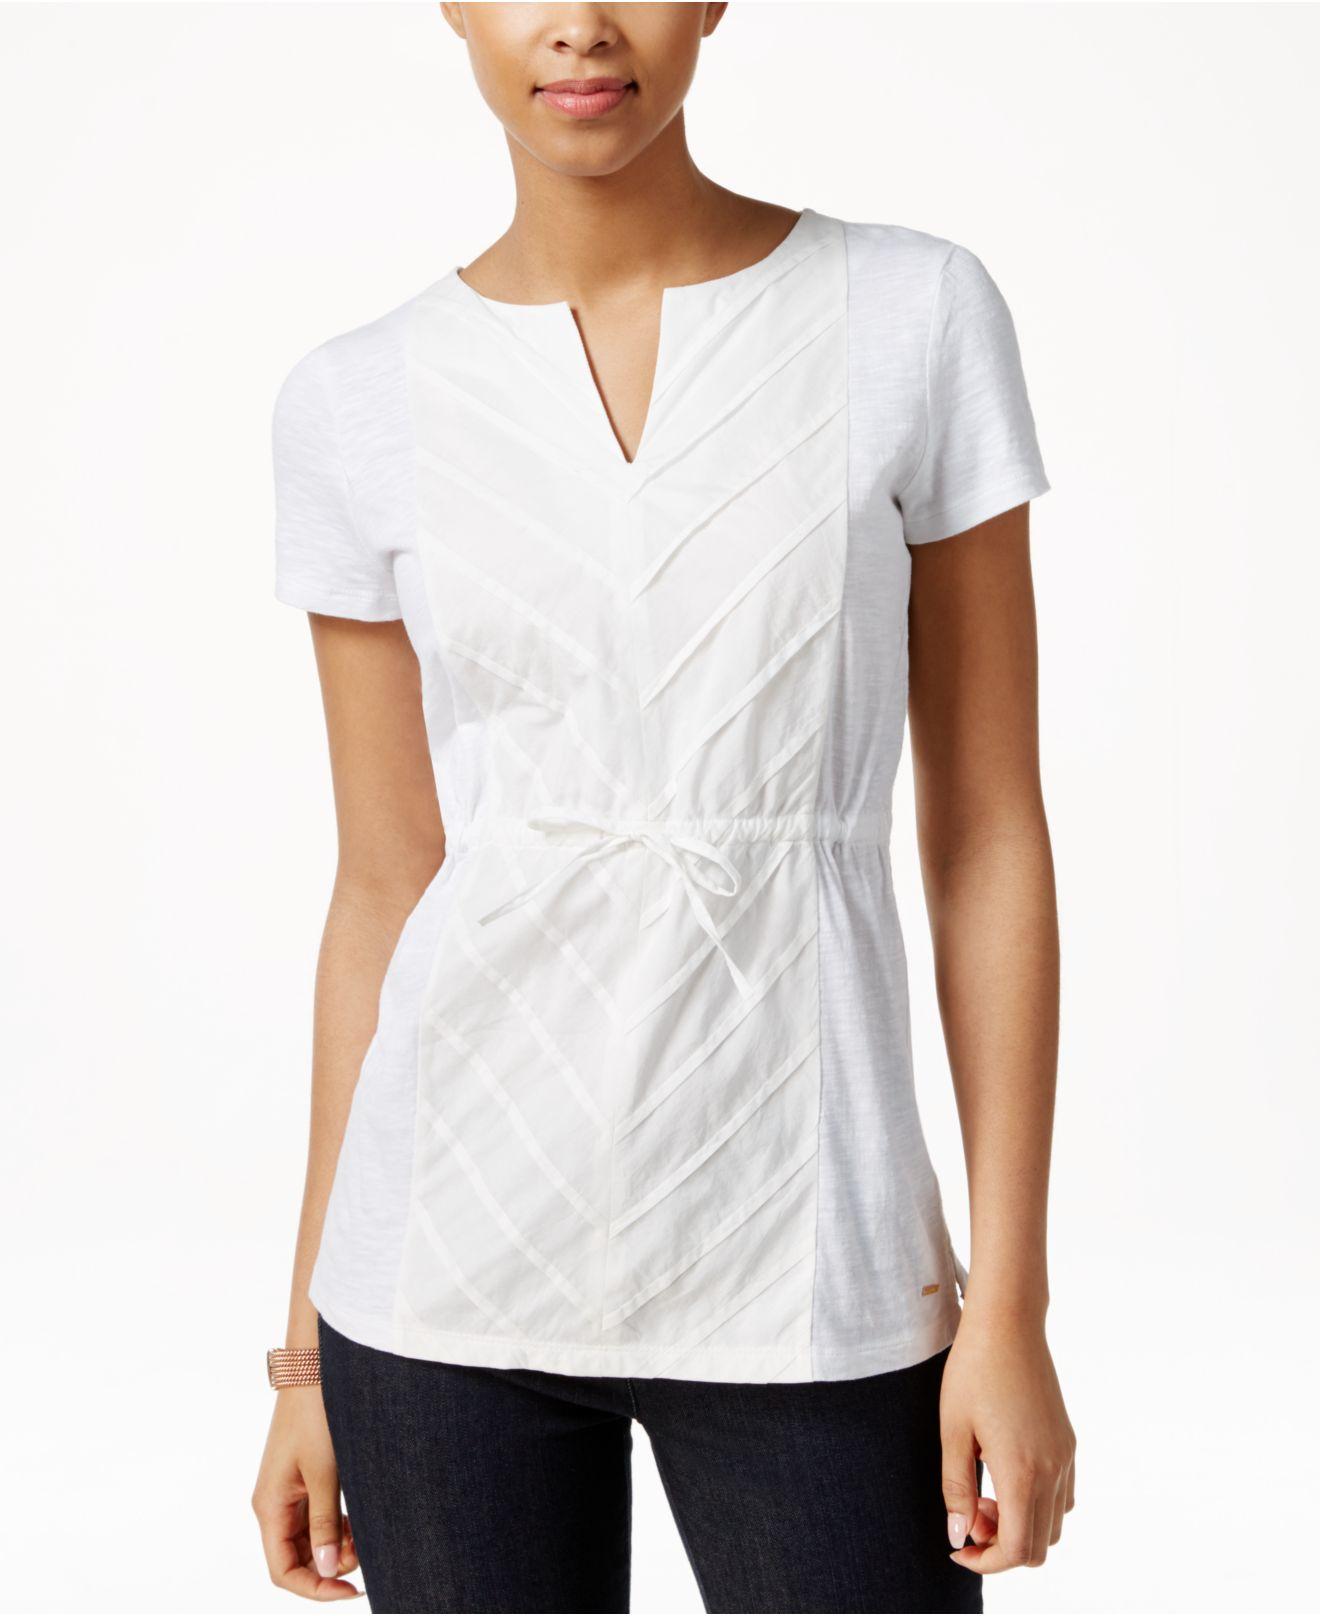 Macys Tommy Hilfiger Womens Shirts Anlis